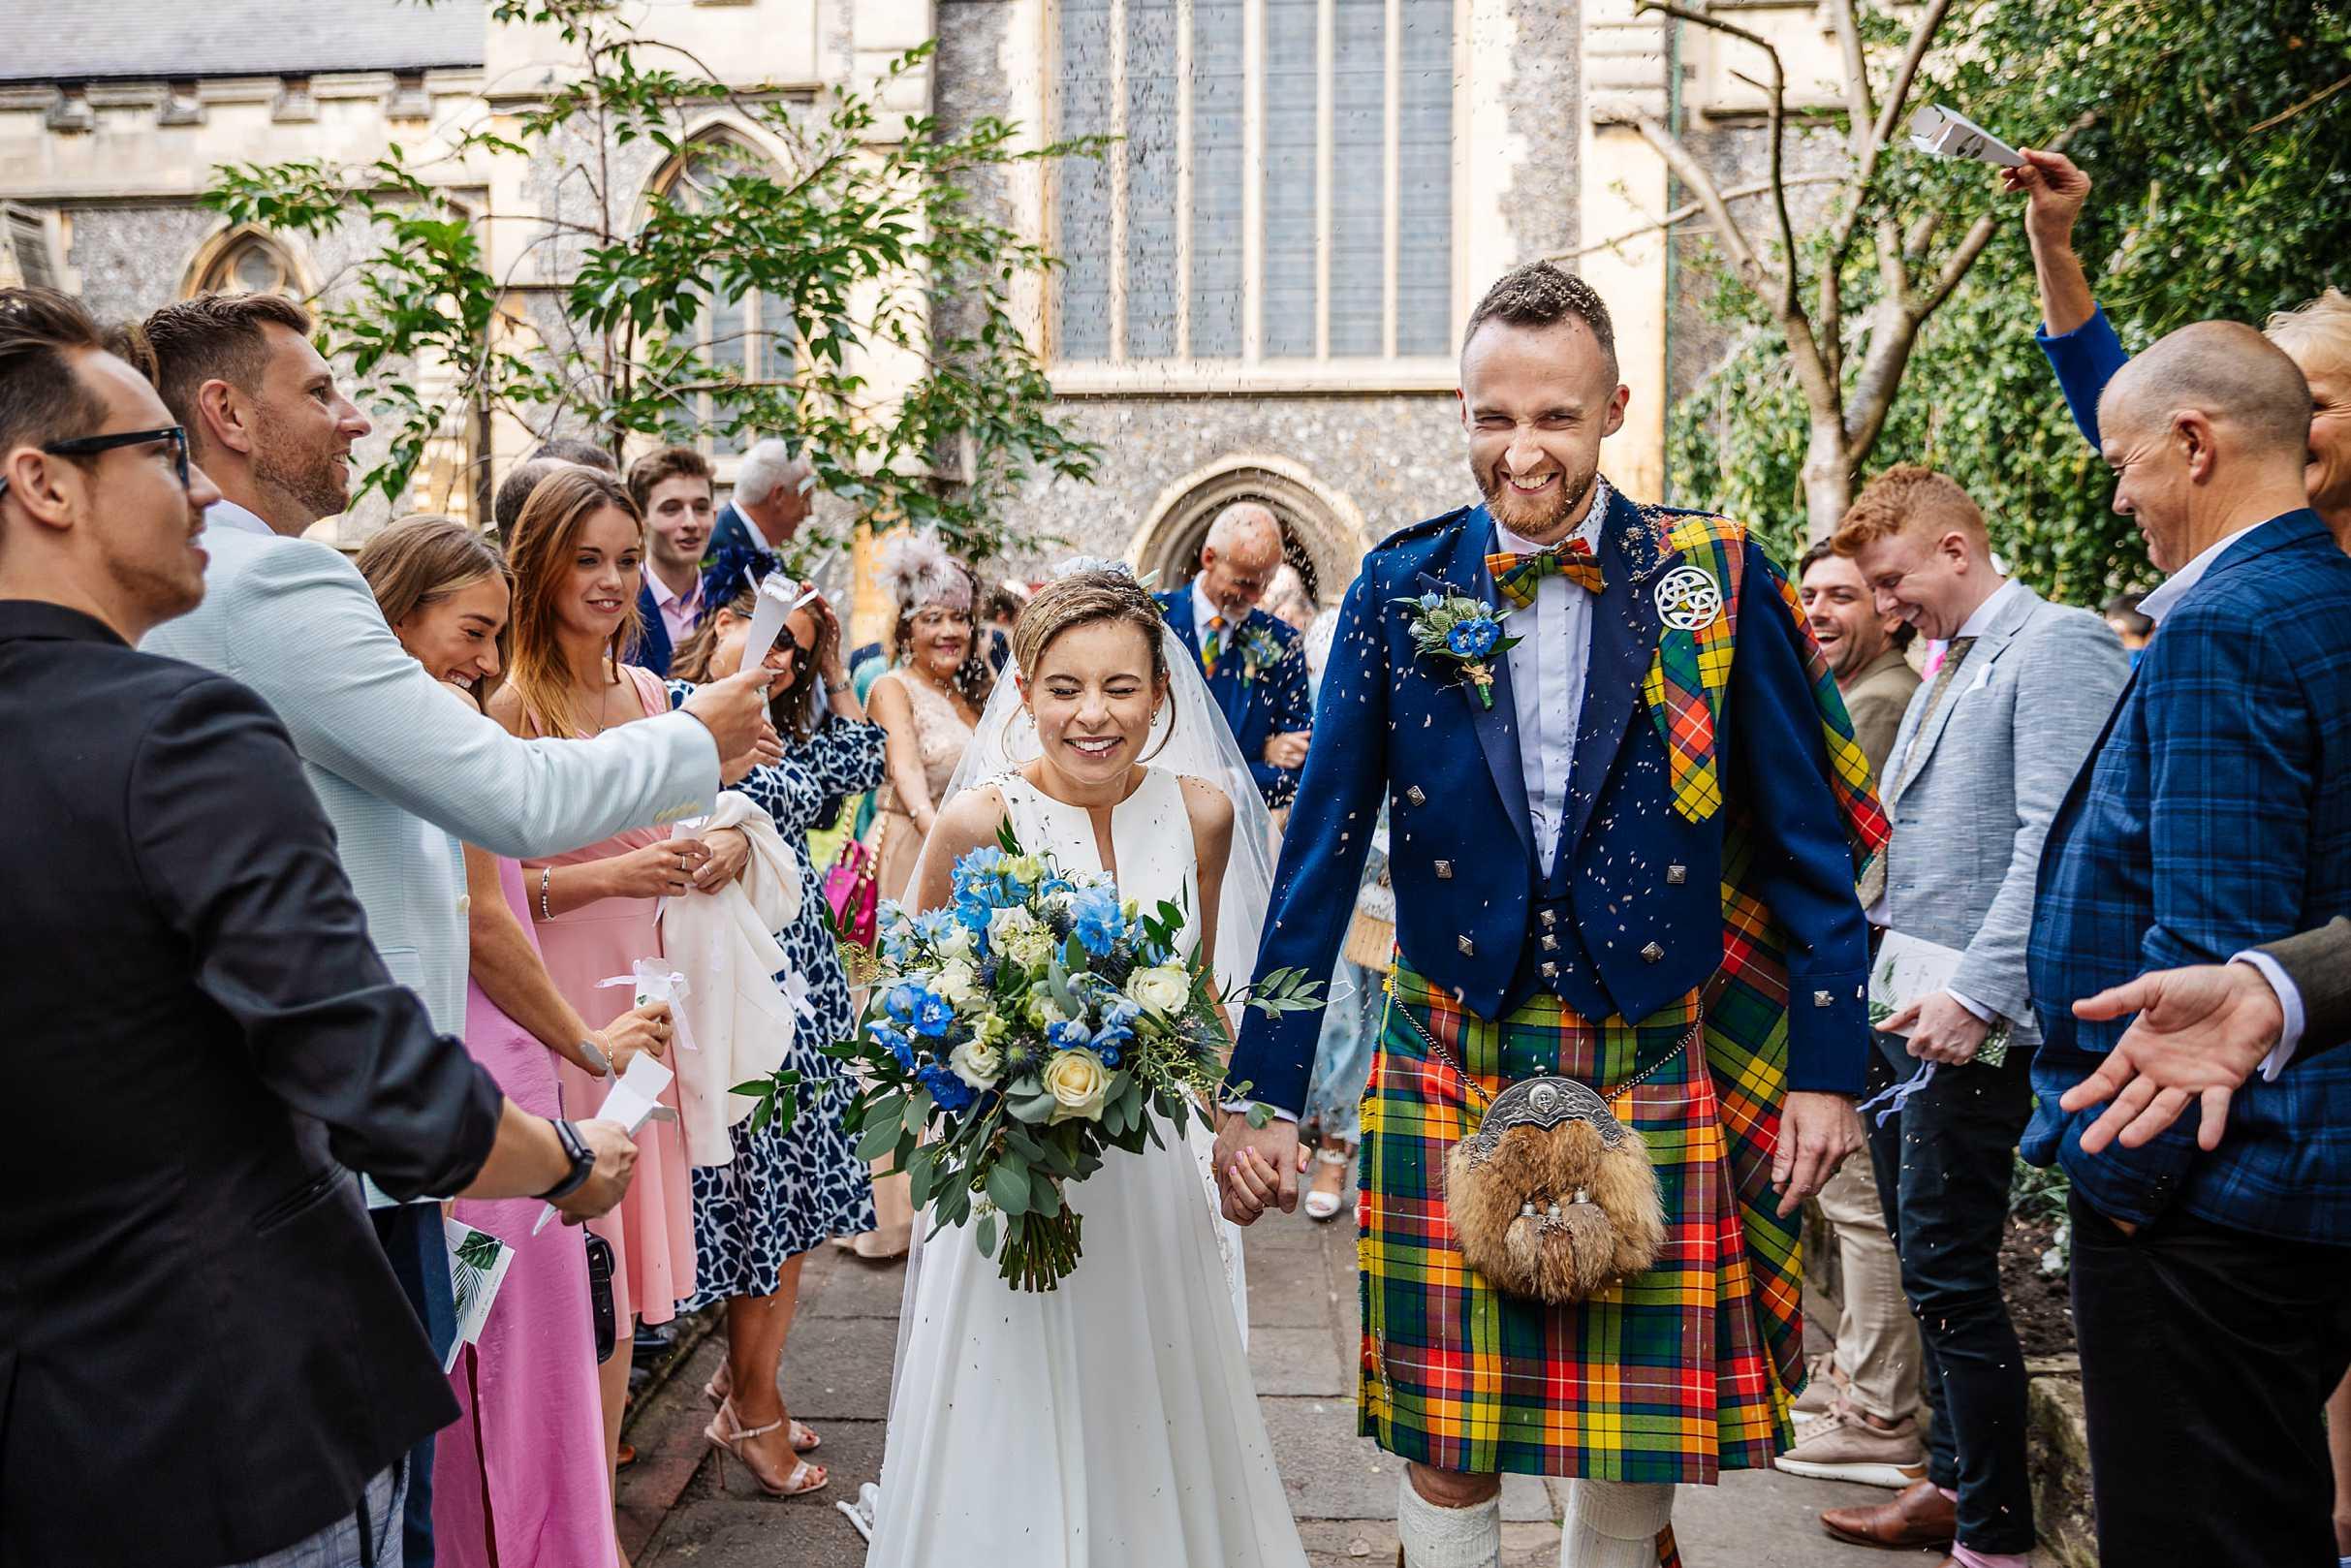 RHS Wisley Wedding - Emily & Peter